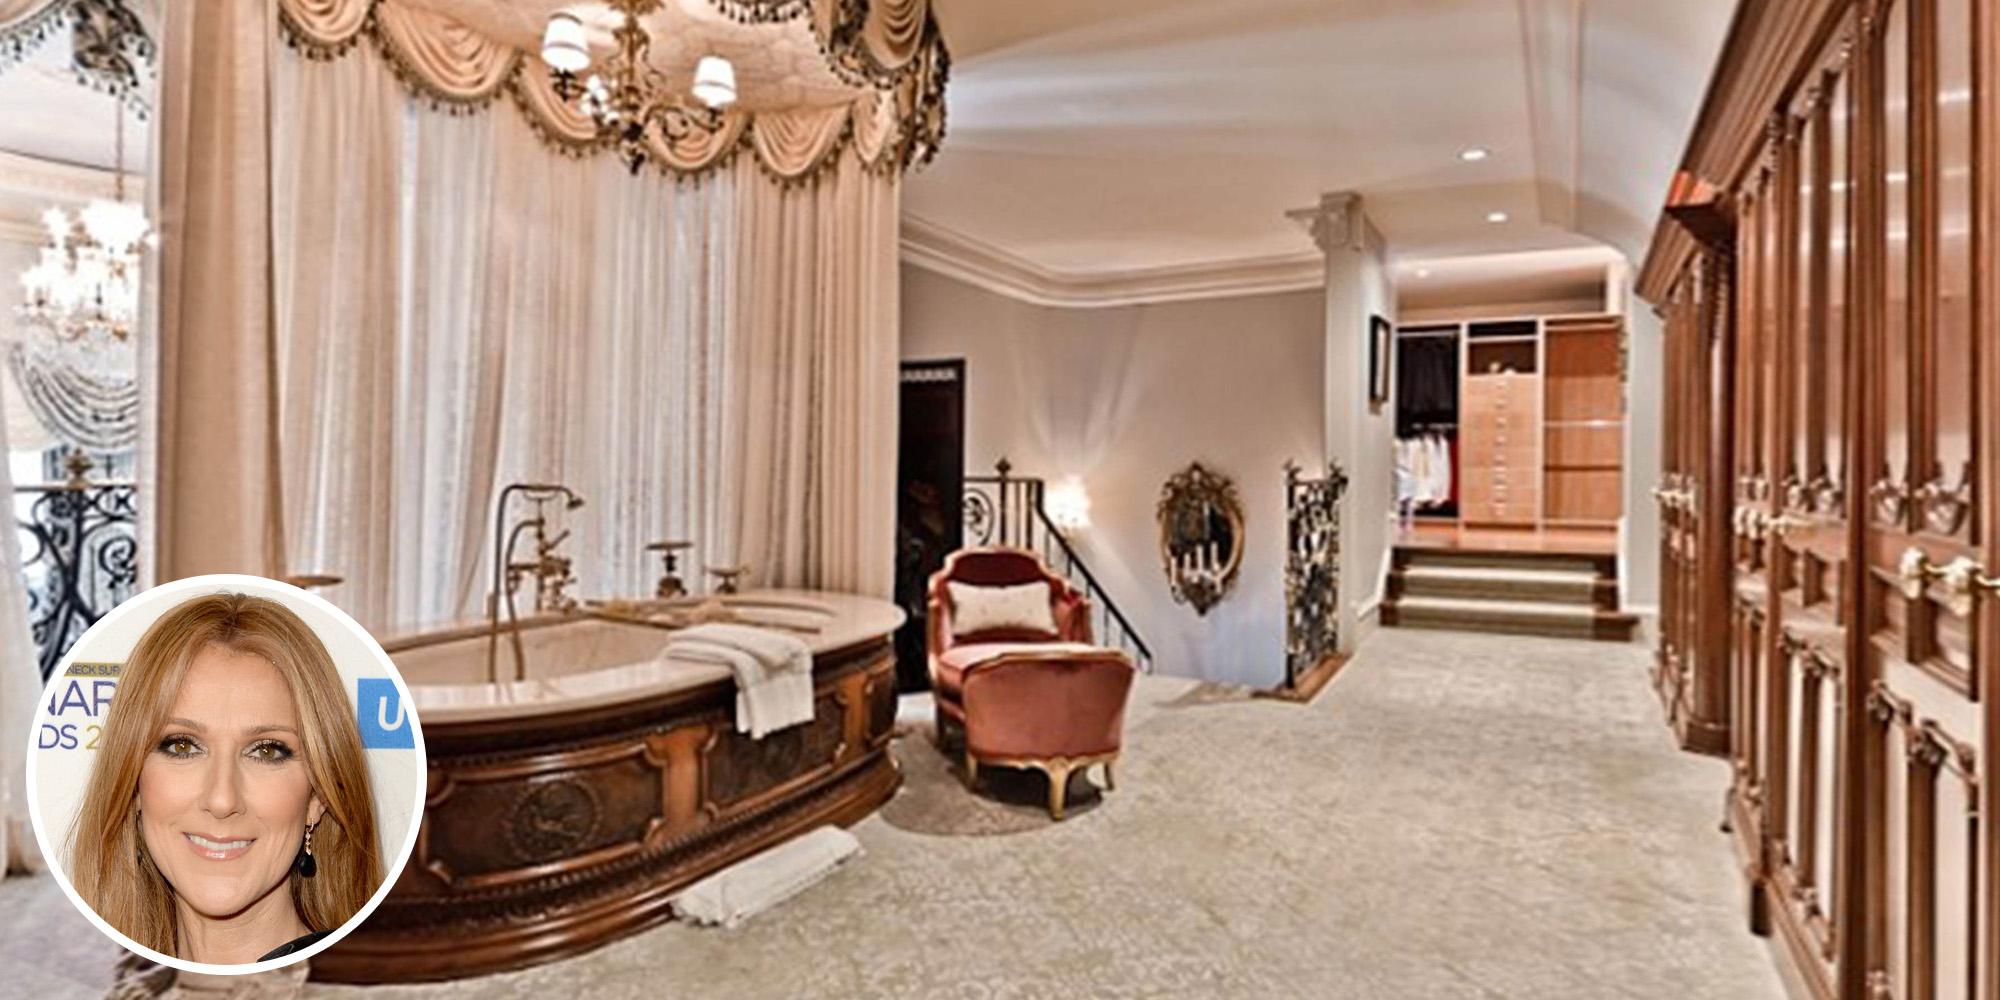 Kris Jenner Bedroom Decor Kris Jenners Bathroom Million Condo Luvskcom